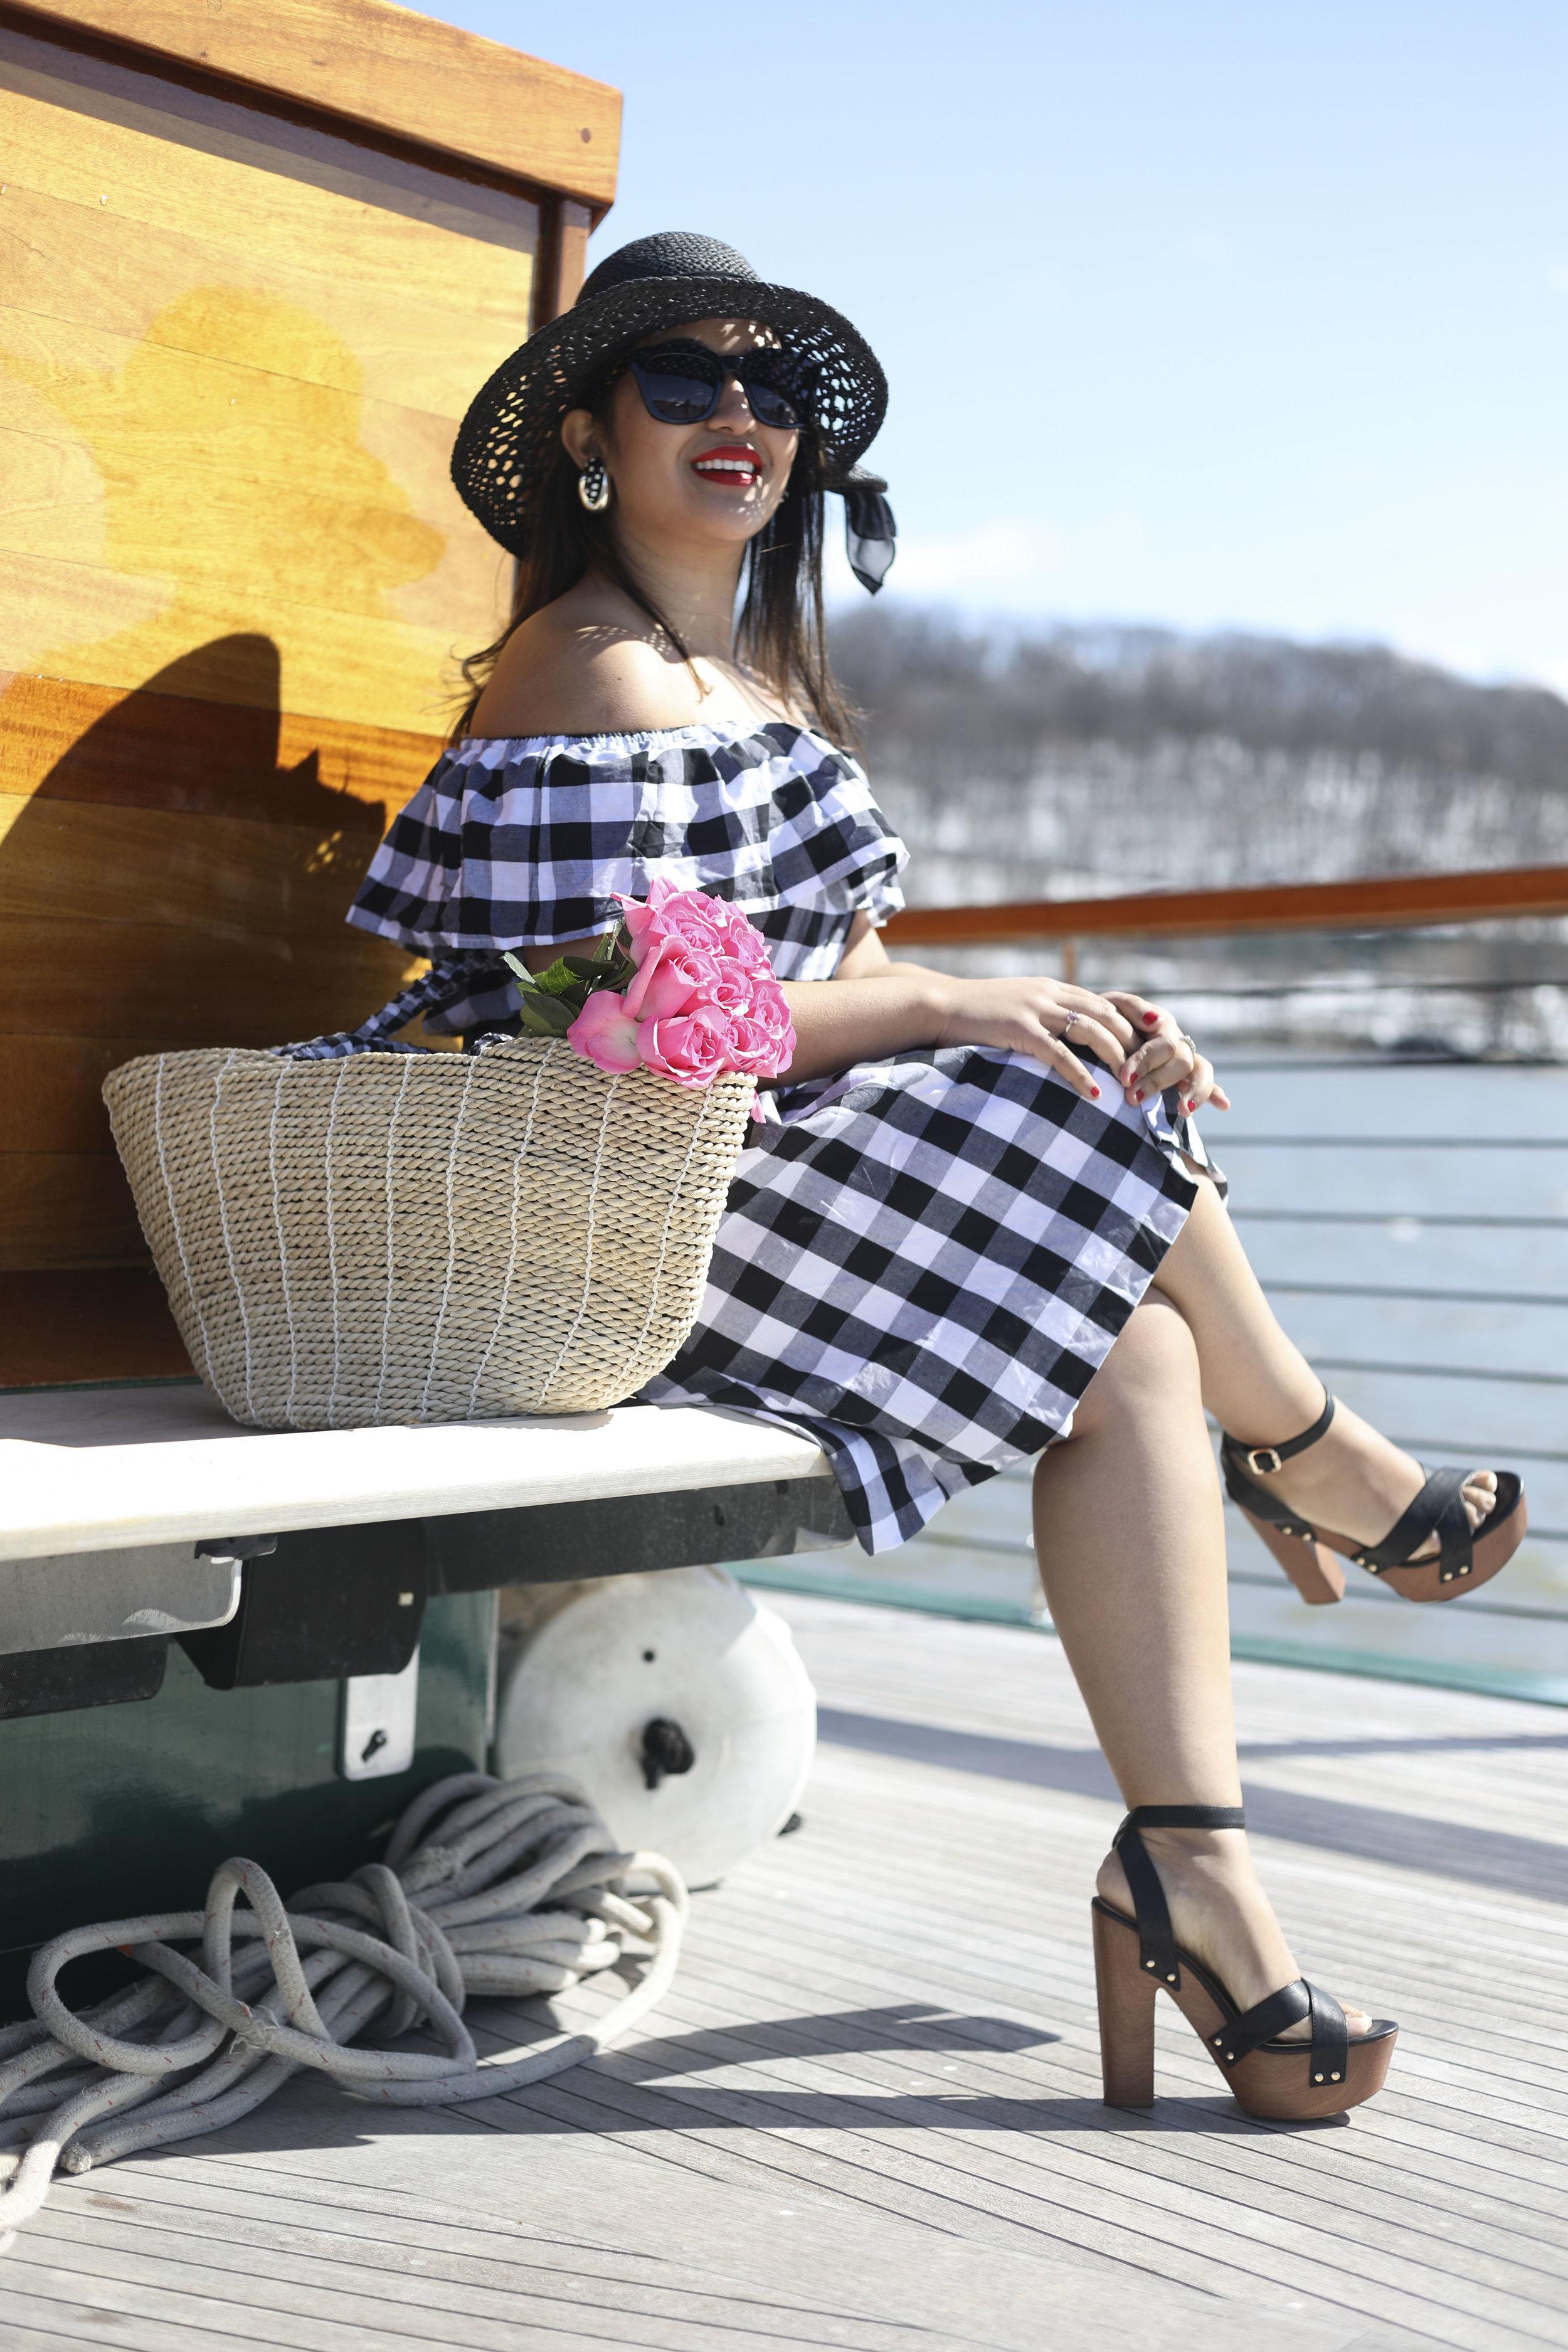 Krity S x Make Me Chic x Harbor Line Cruise1.jpg